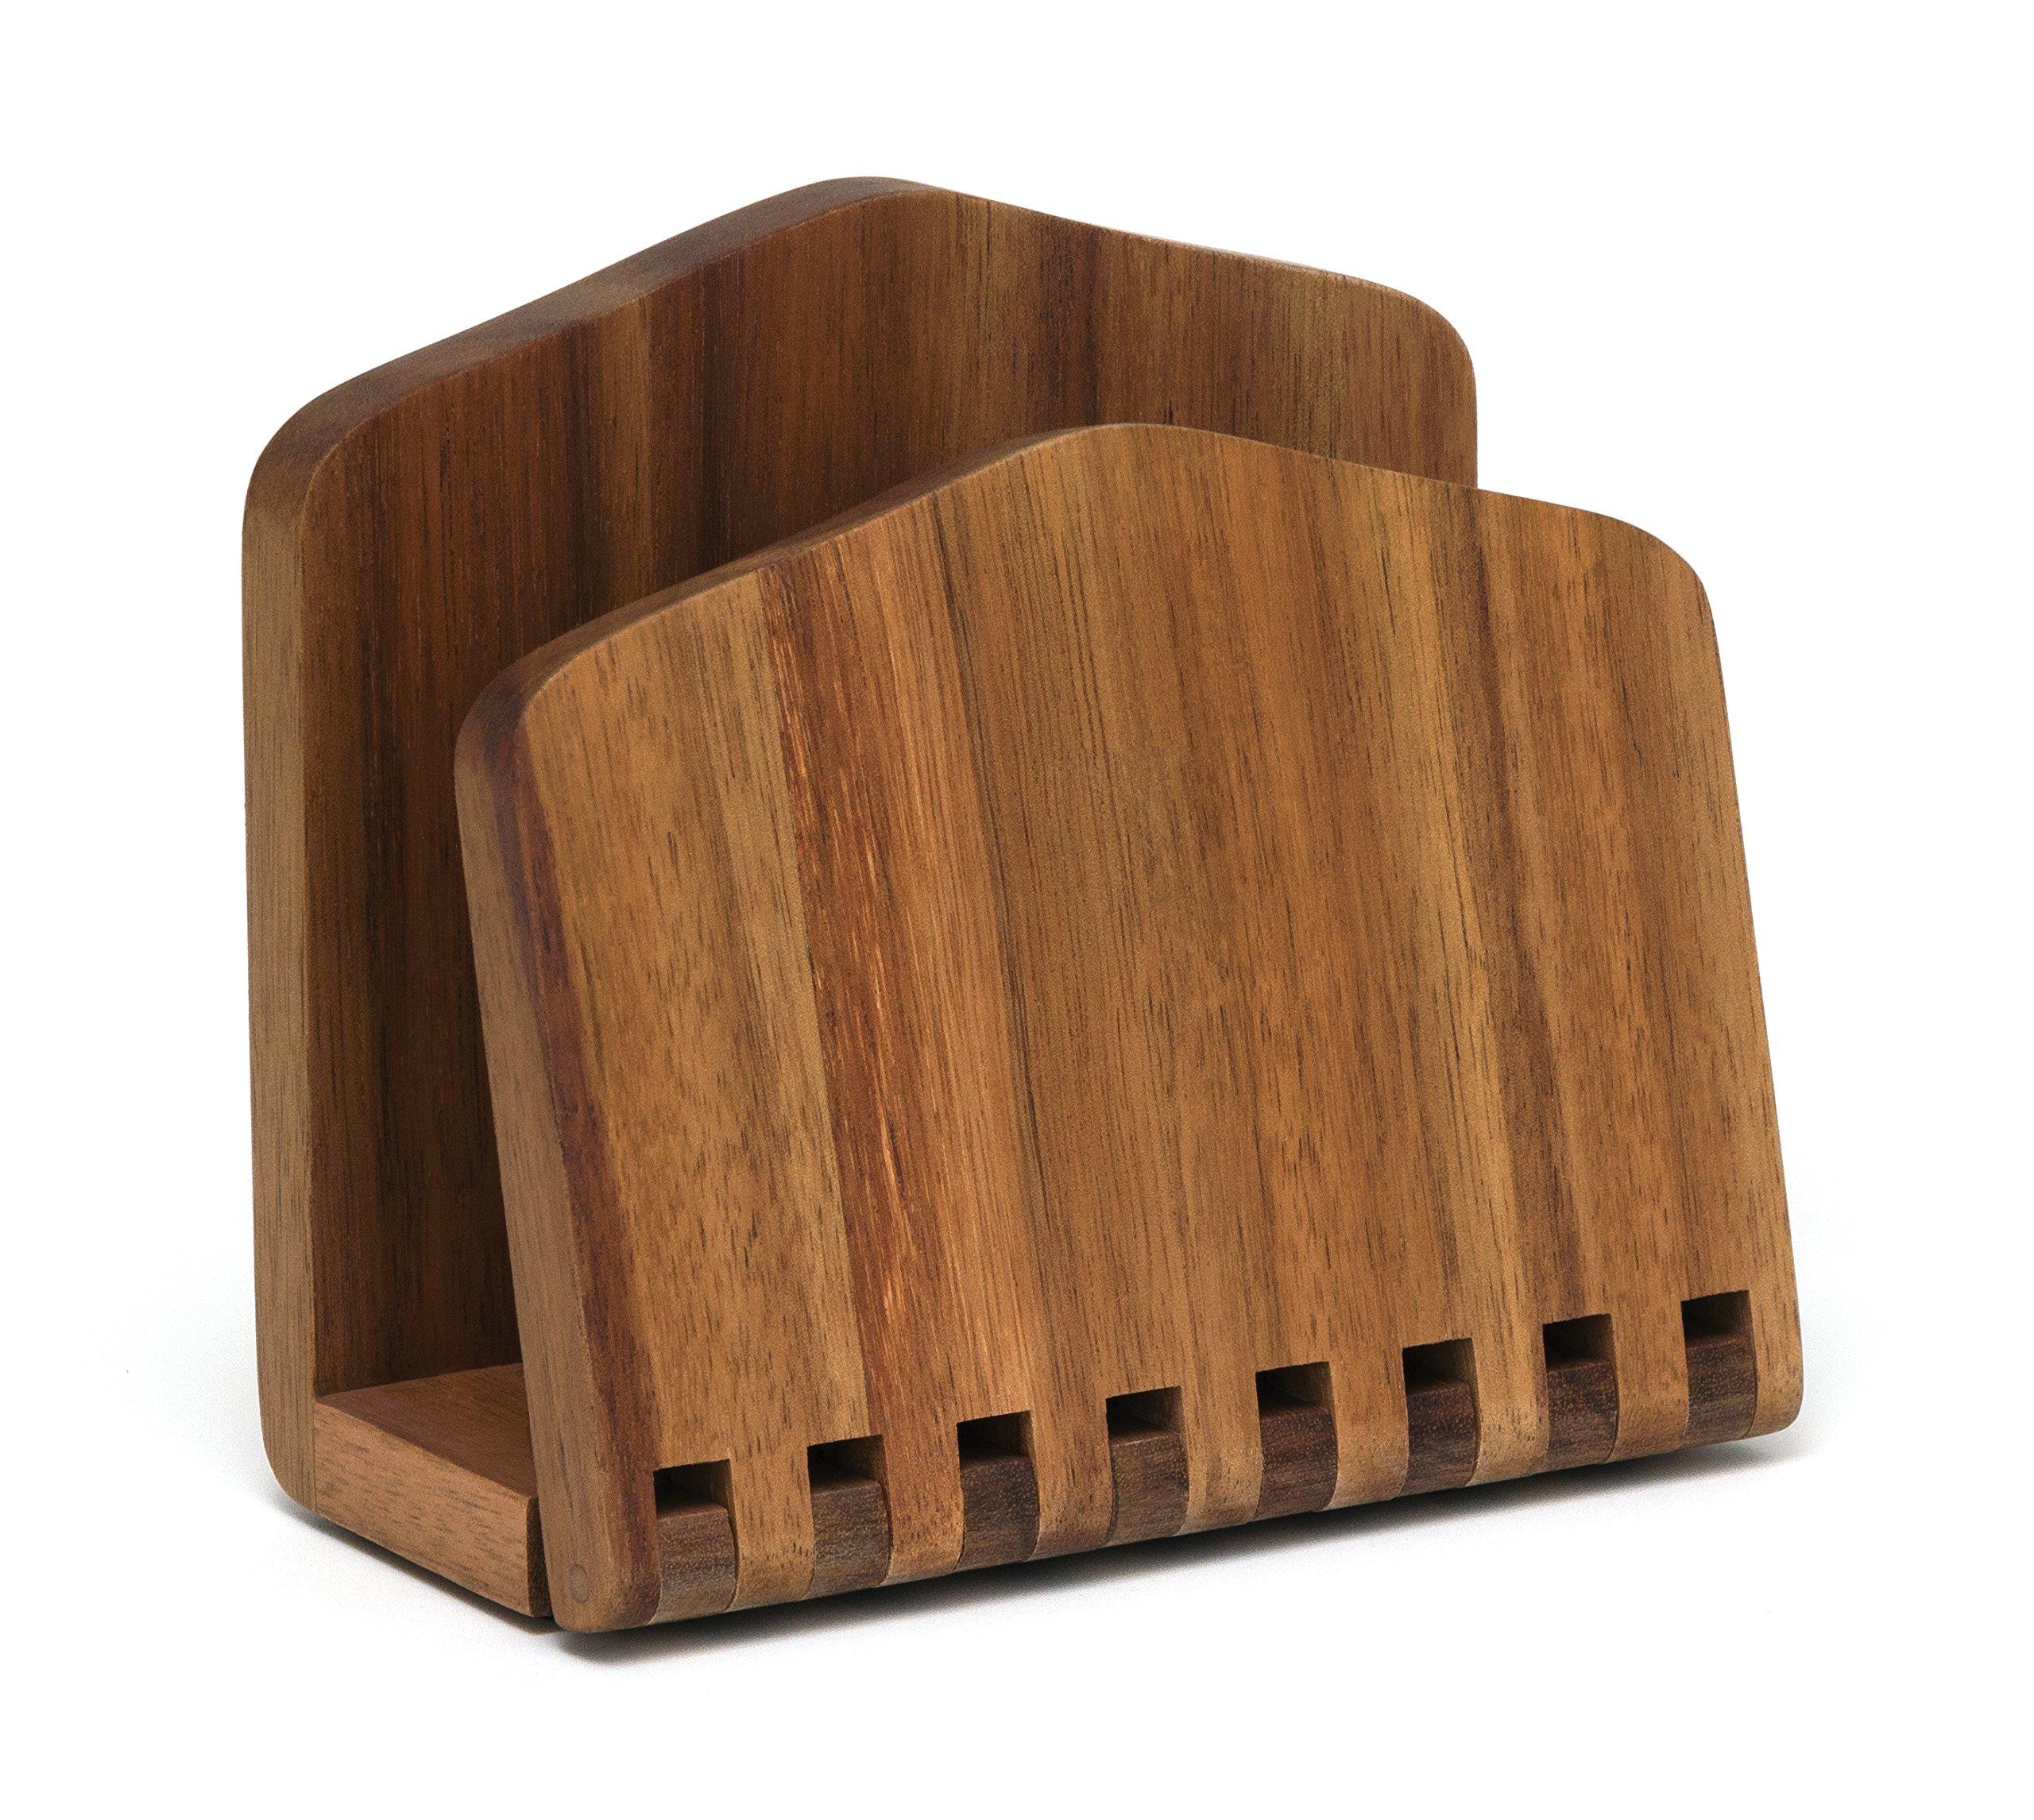 Lipper International 1160 Acacia Wood Adjustable Napkin Holder, 6-1/2'' x 3-1/4'' x 6'' by Lipper International (Image #1)